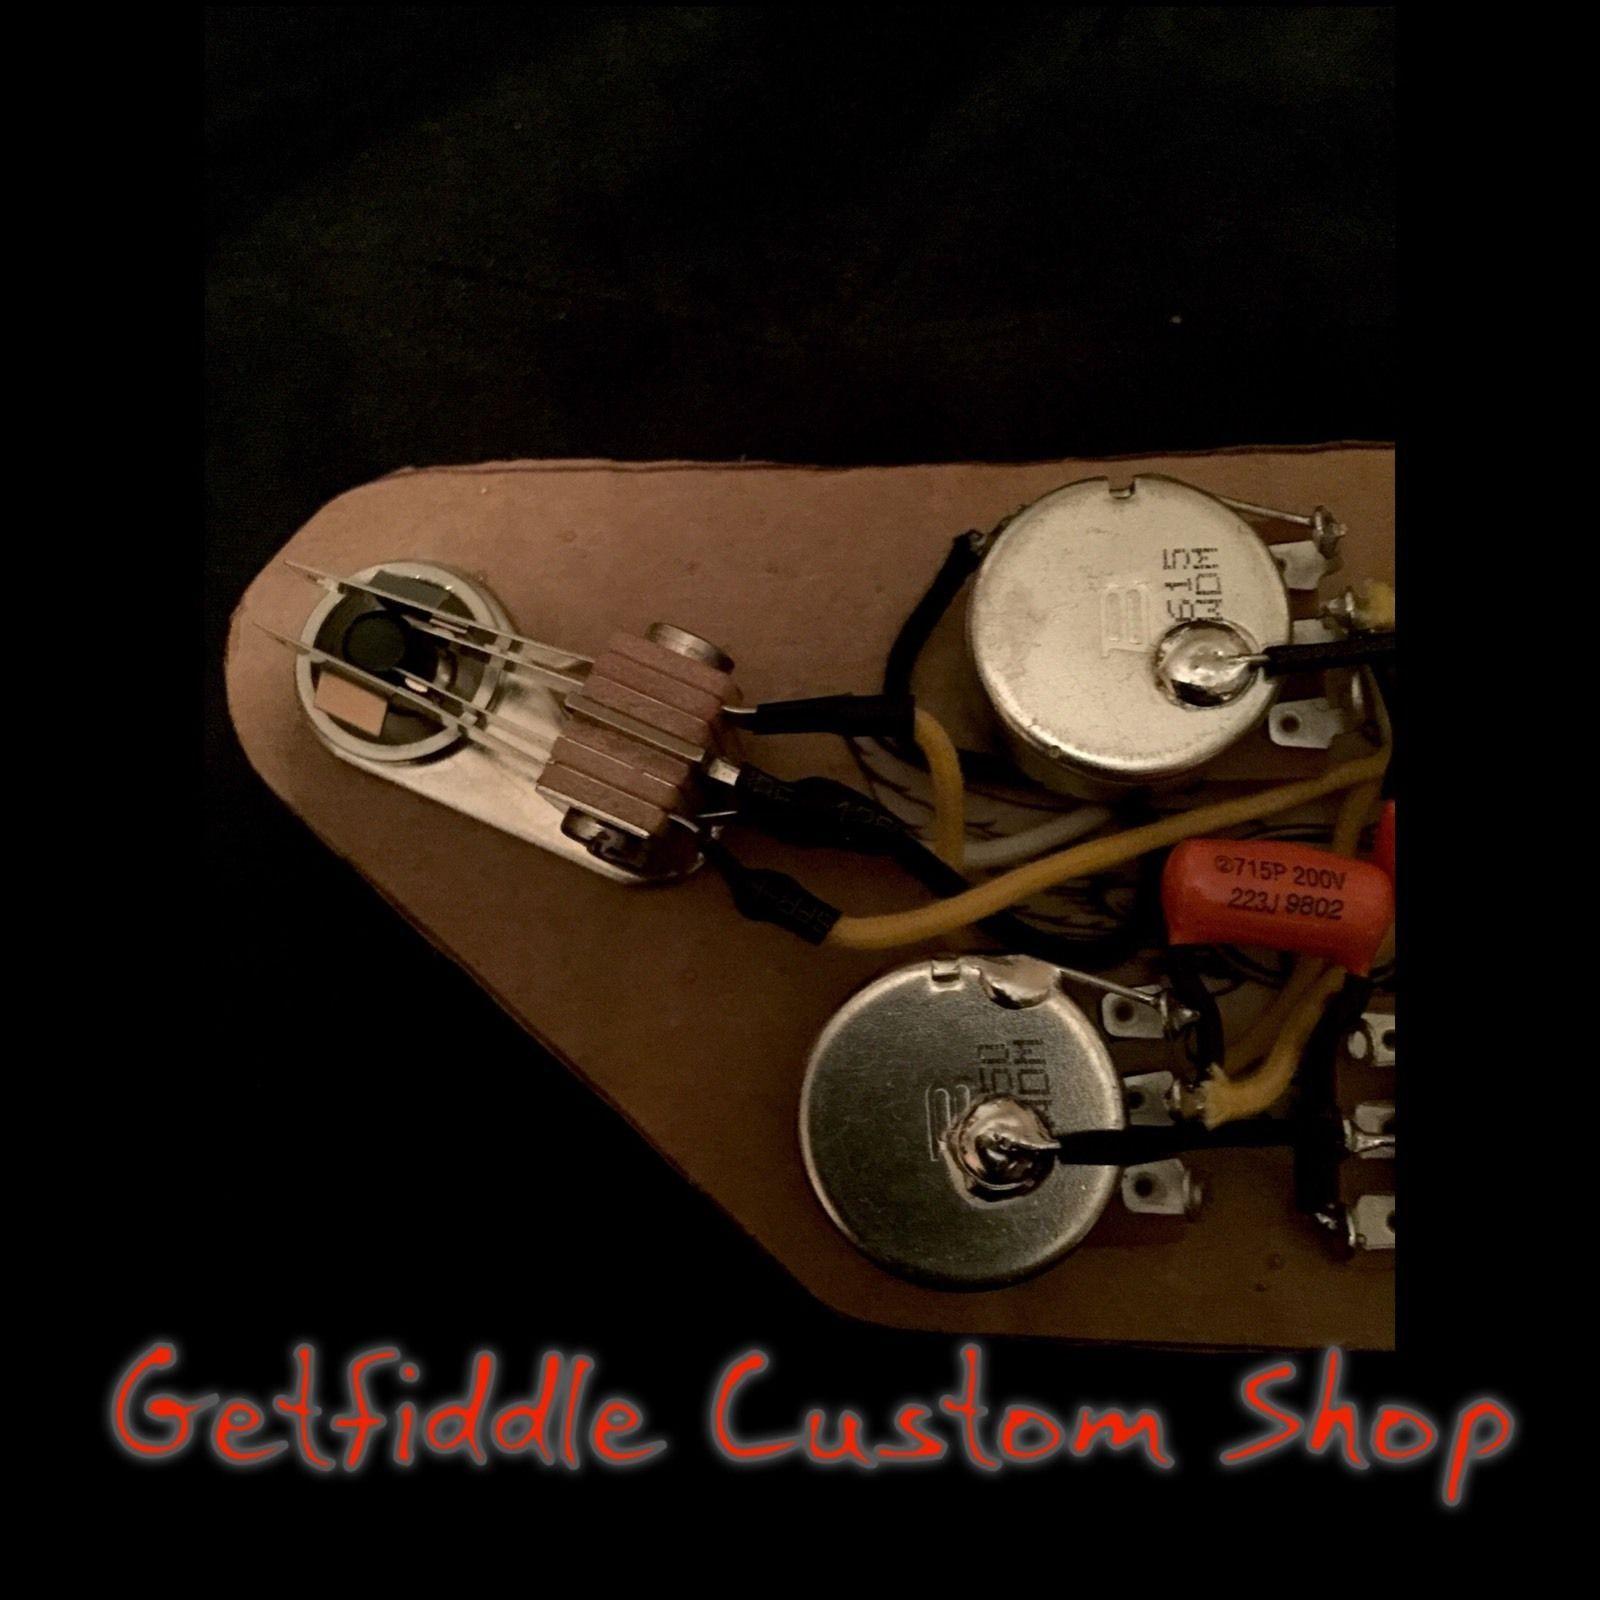 sg 50 s wiring harness gibson epiphone 022 015 cap bourns pots switchcraft ebay [ 1600 x 1600 Pixel ]